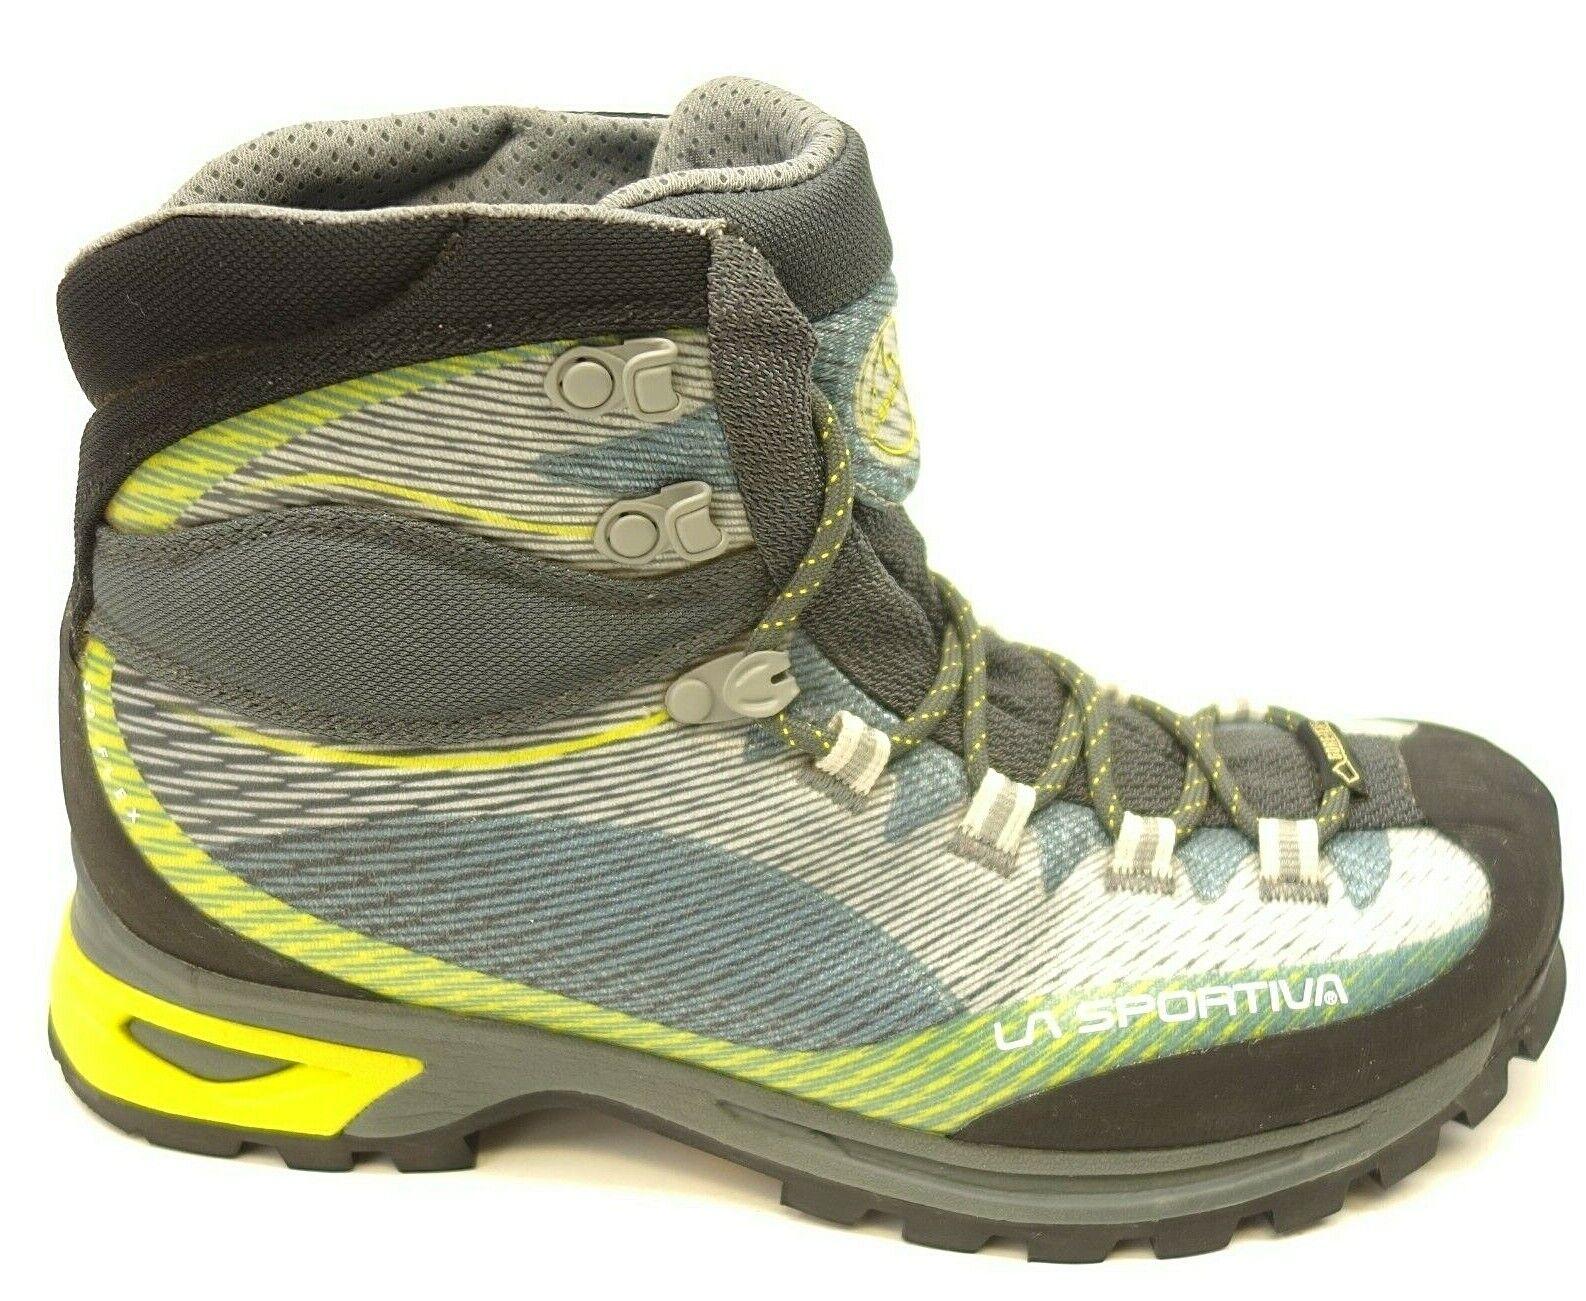 La Sportiva Sz US 7.5+ EU EU EU 39 Trango TRK GTX WP Mountaineering Womens Boots f87d66